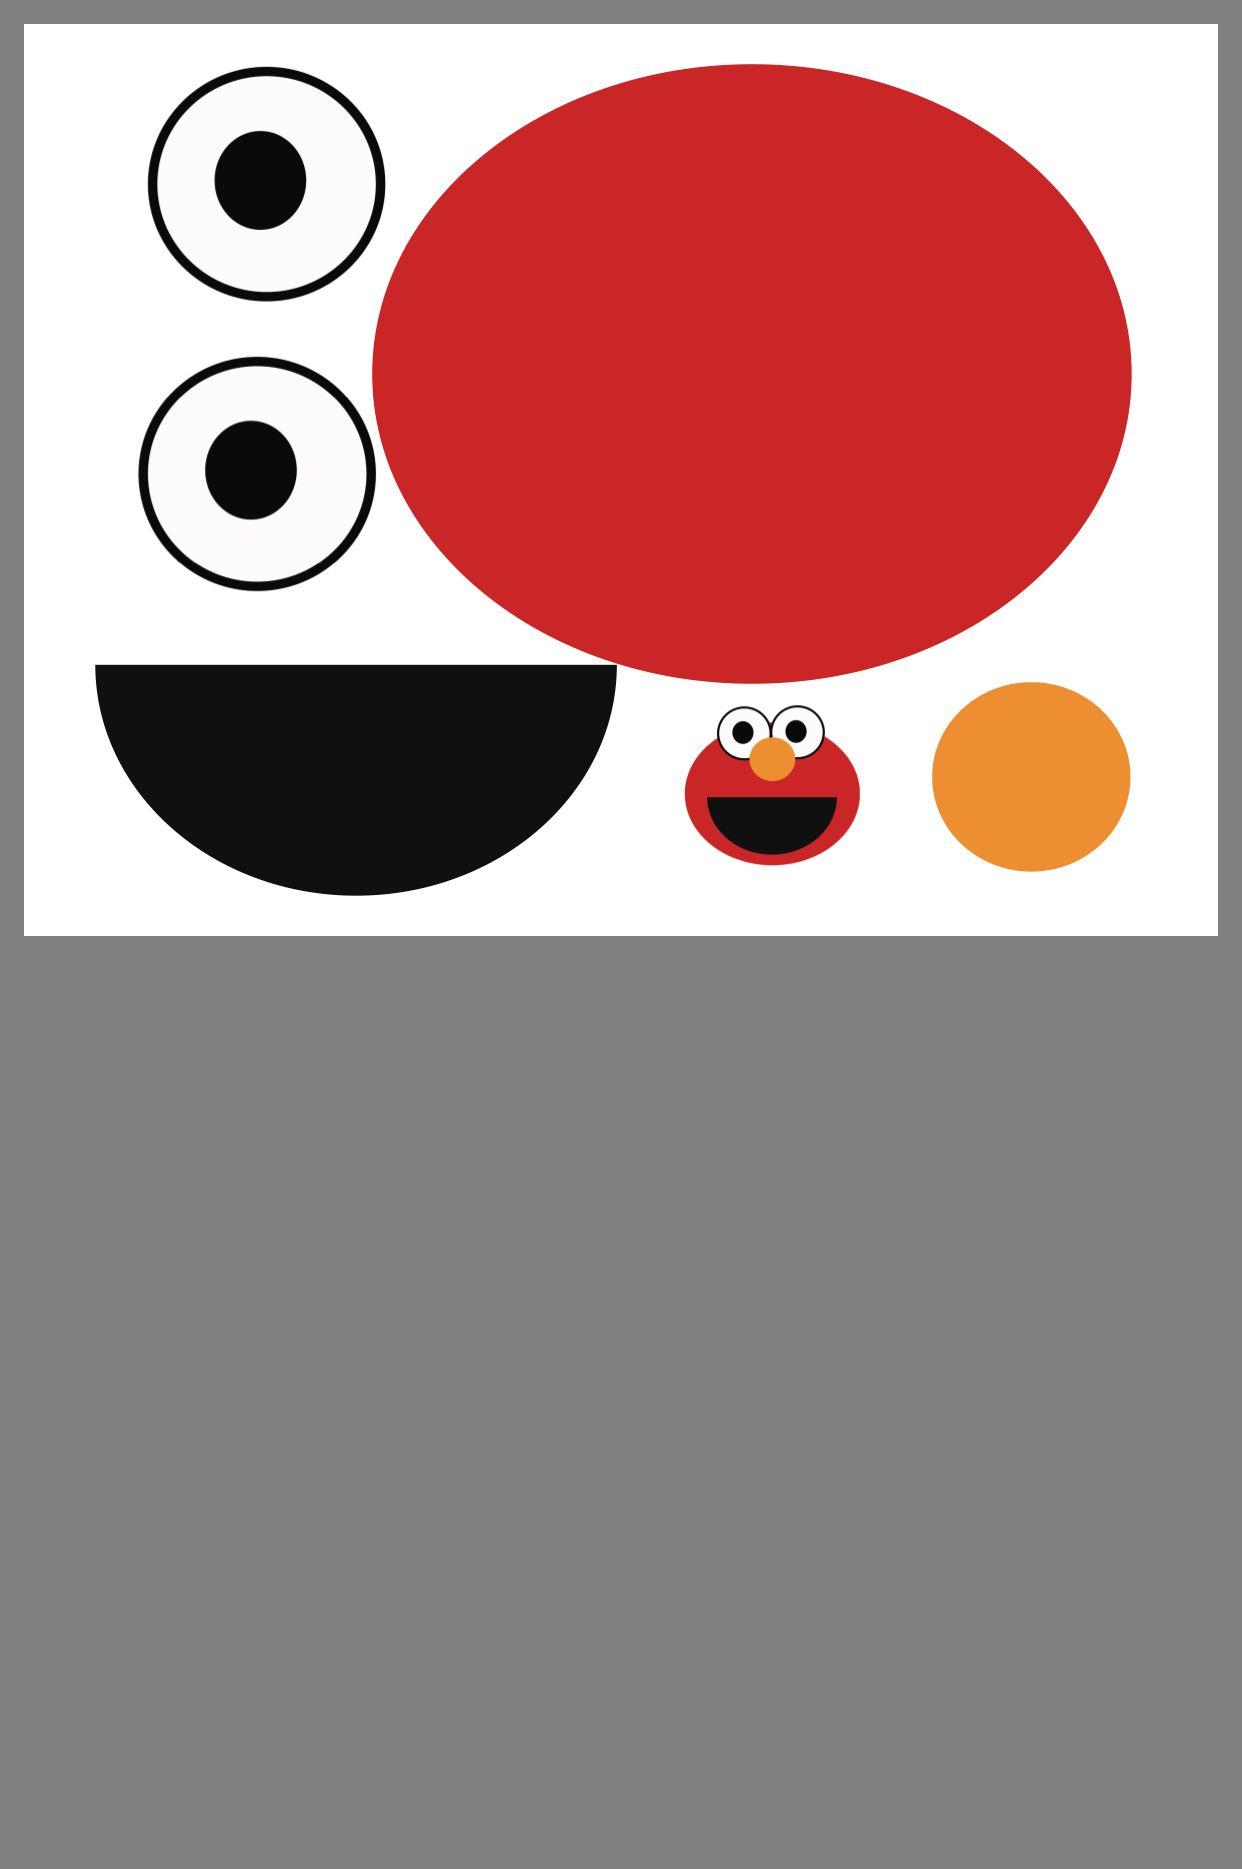 Pin By Nokwazi Khumalo On Alphabet Crafts With Images